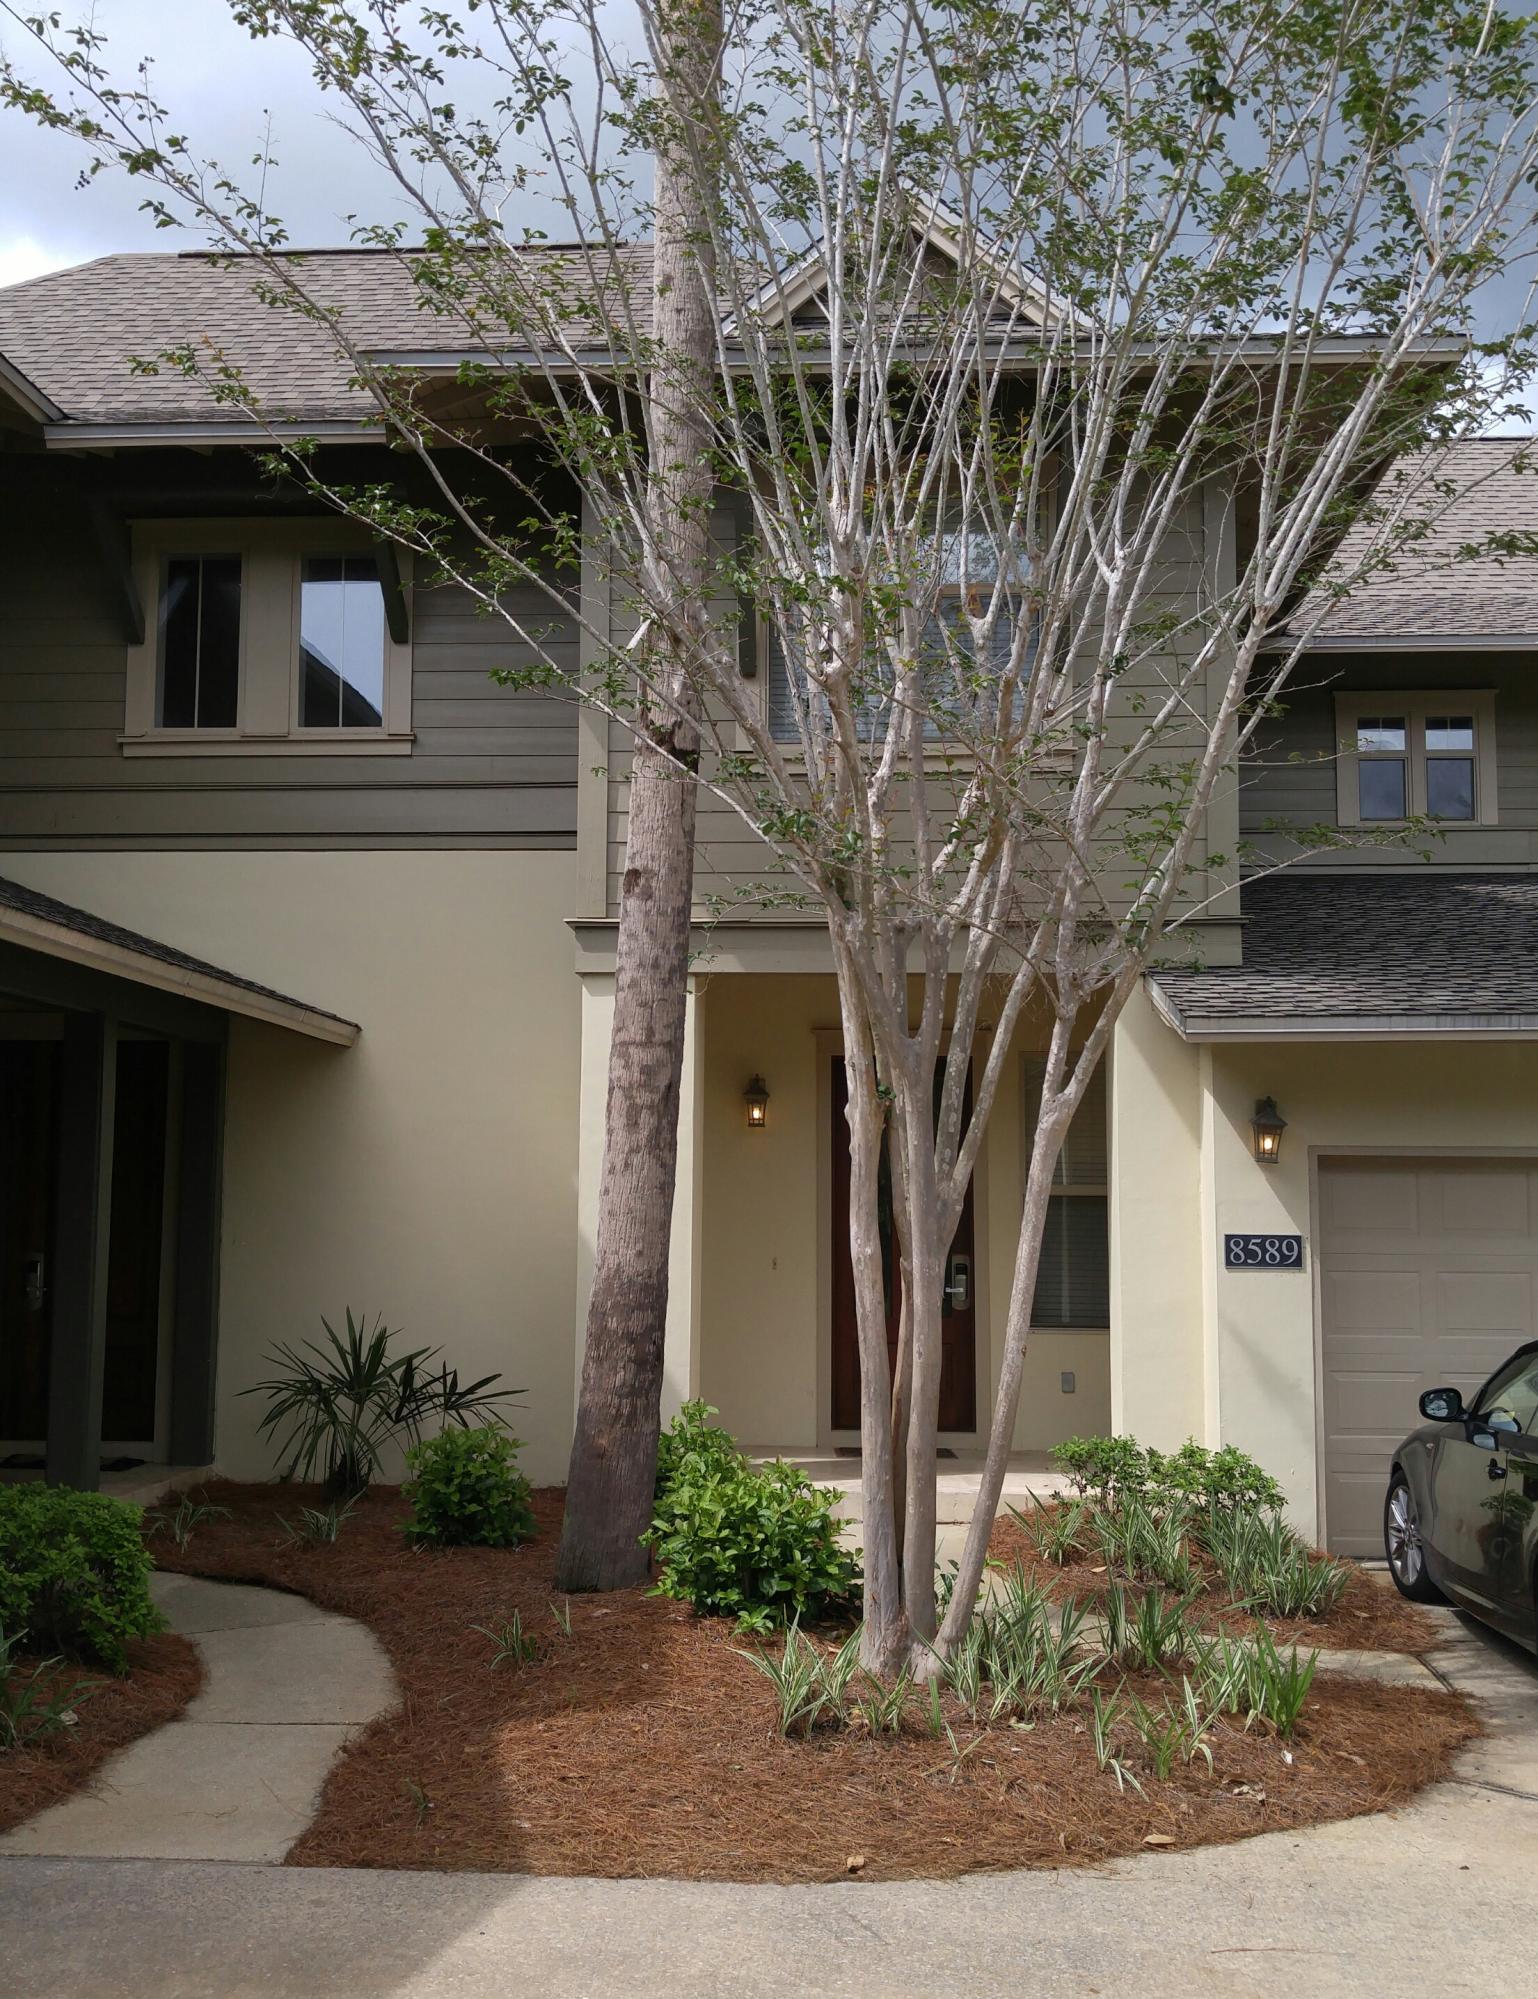 8589 Magnolia Bay Lane, Destin, FL 32550